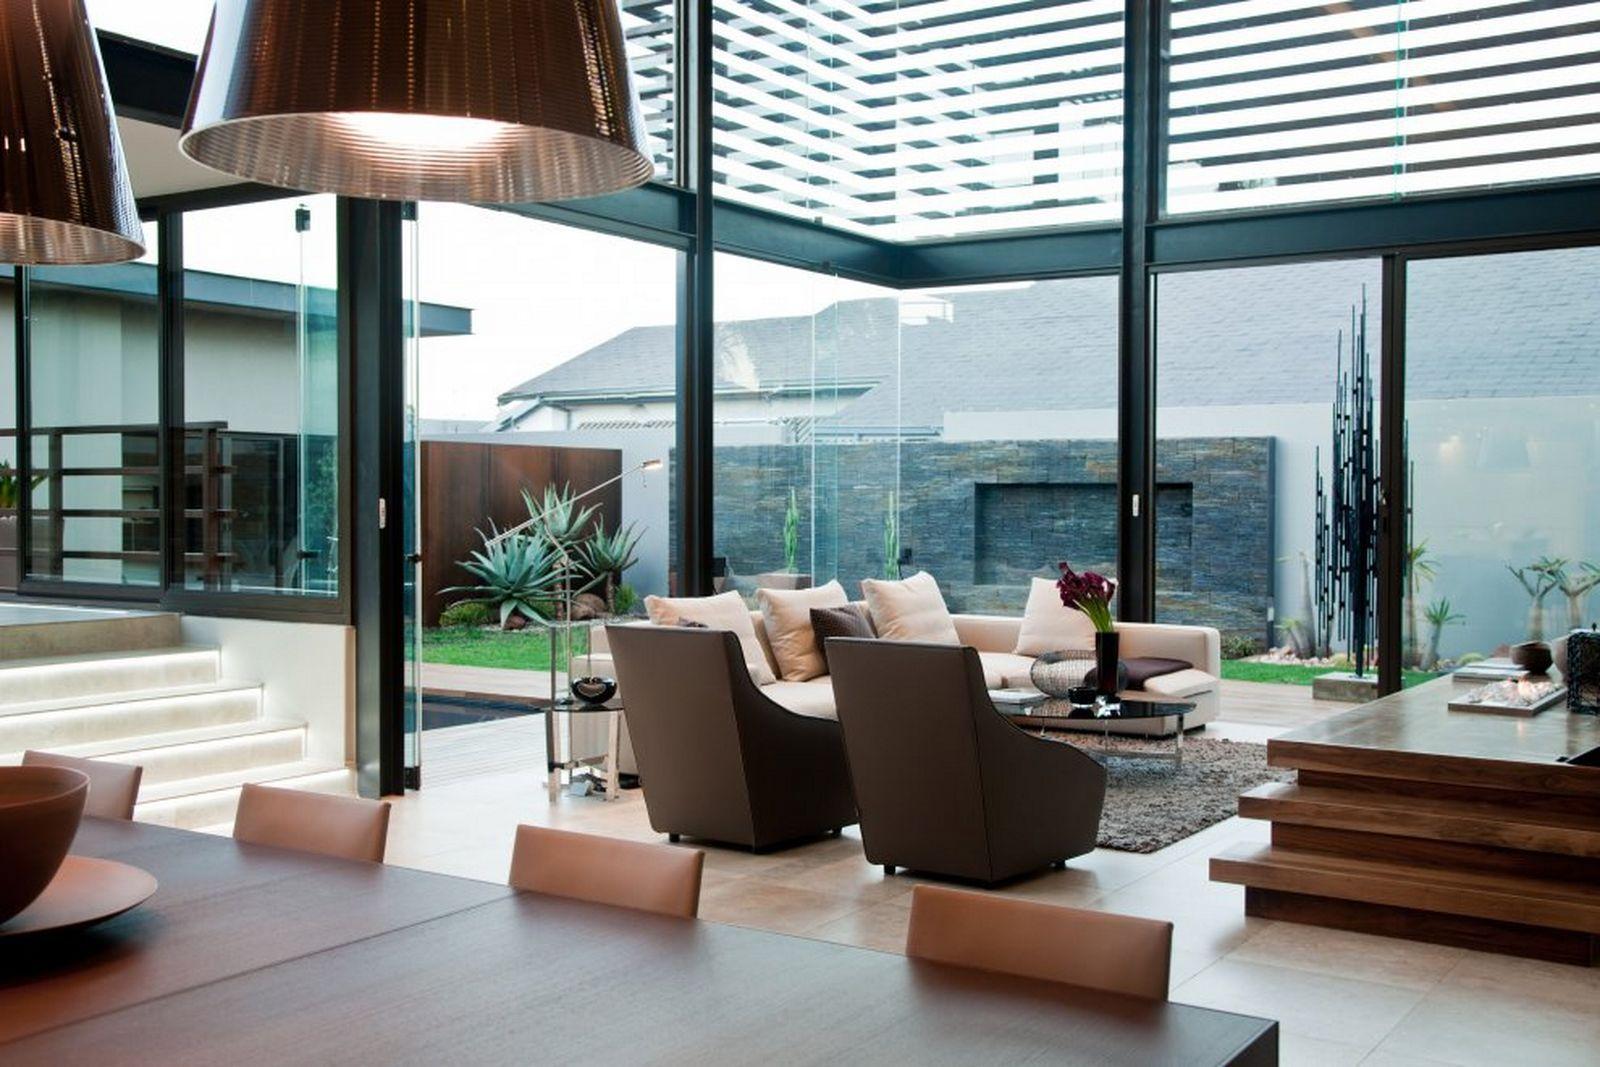 garden design winners darwin - Google Search | Home and interior ...